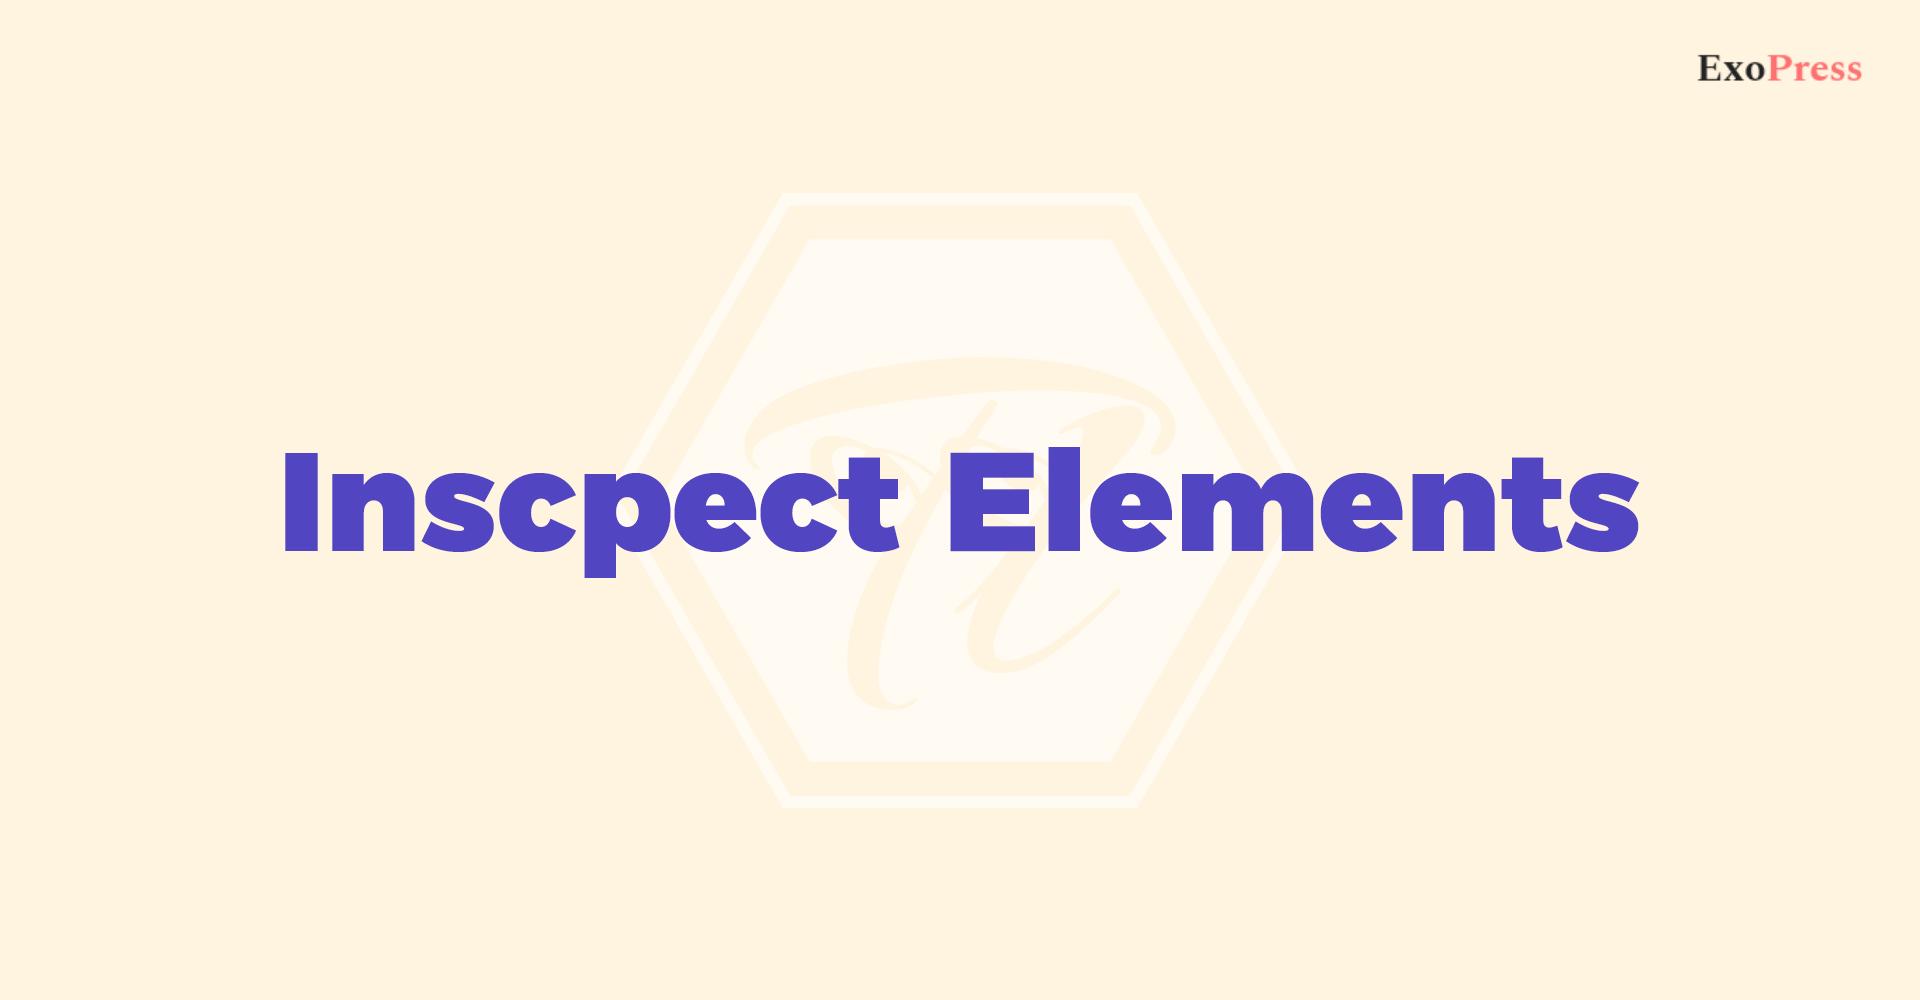 inspect_elements 1 1